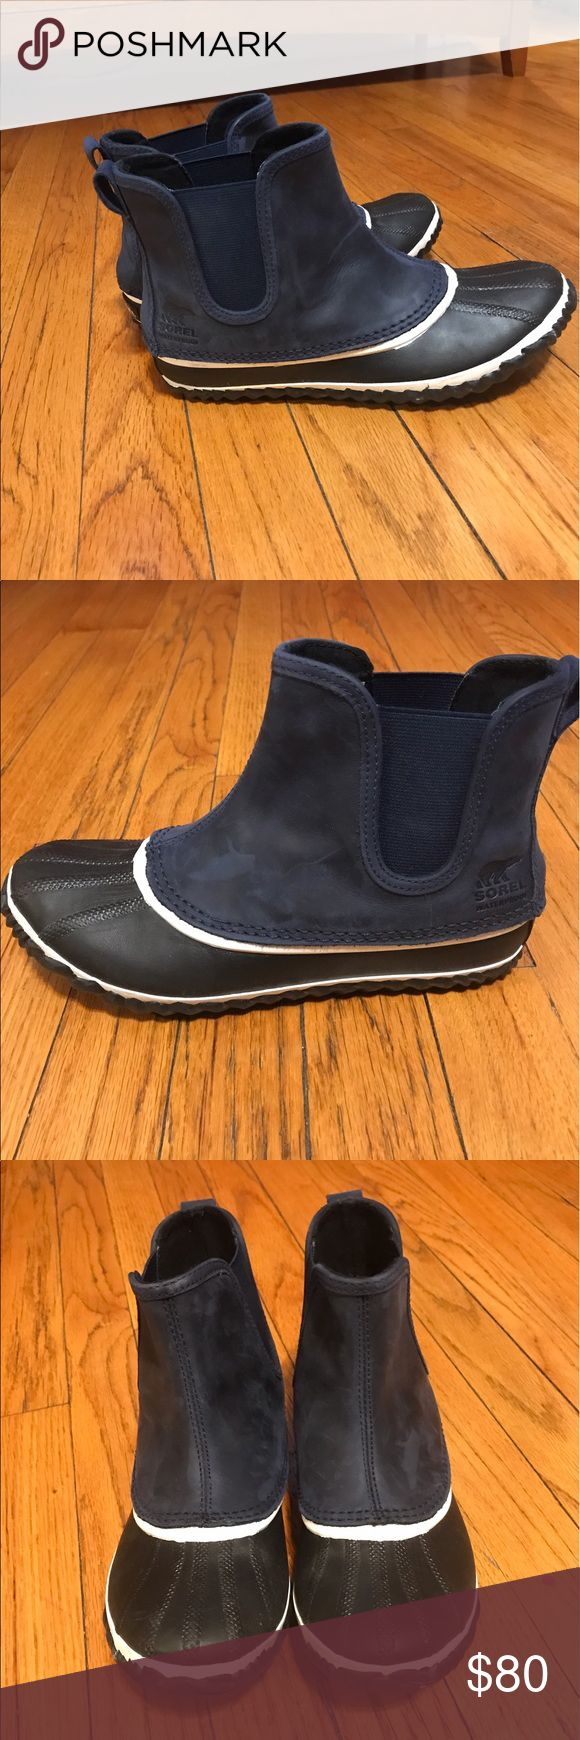 Sorel rain bootie Navy and black Sorel rain booty Sorel Shoes Winter & Rain Boots